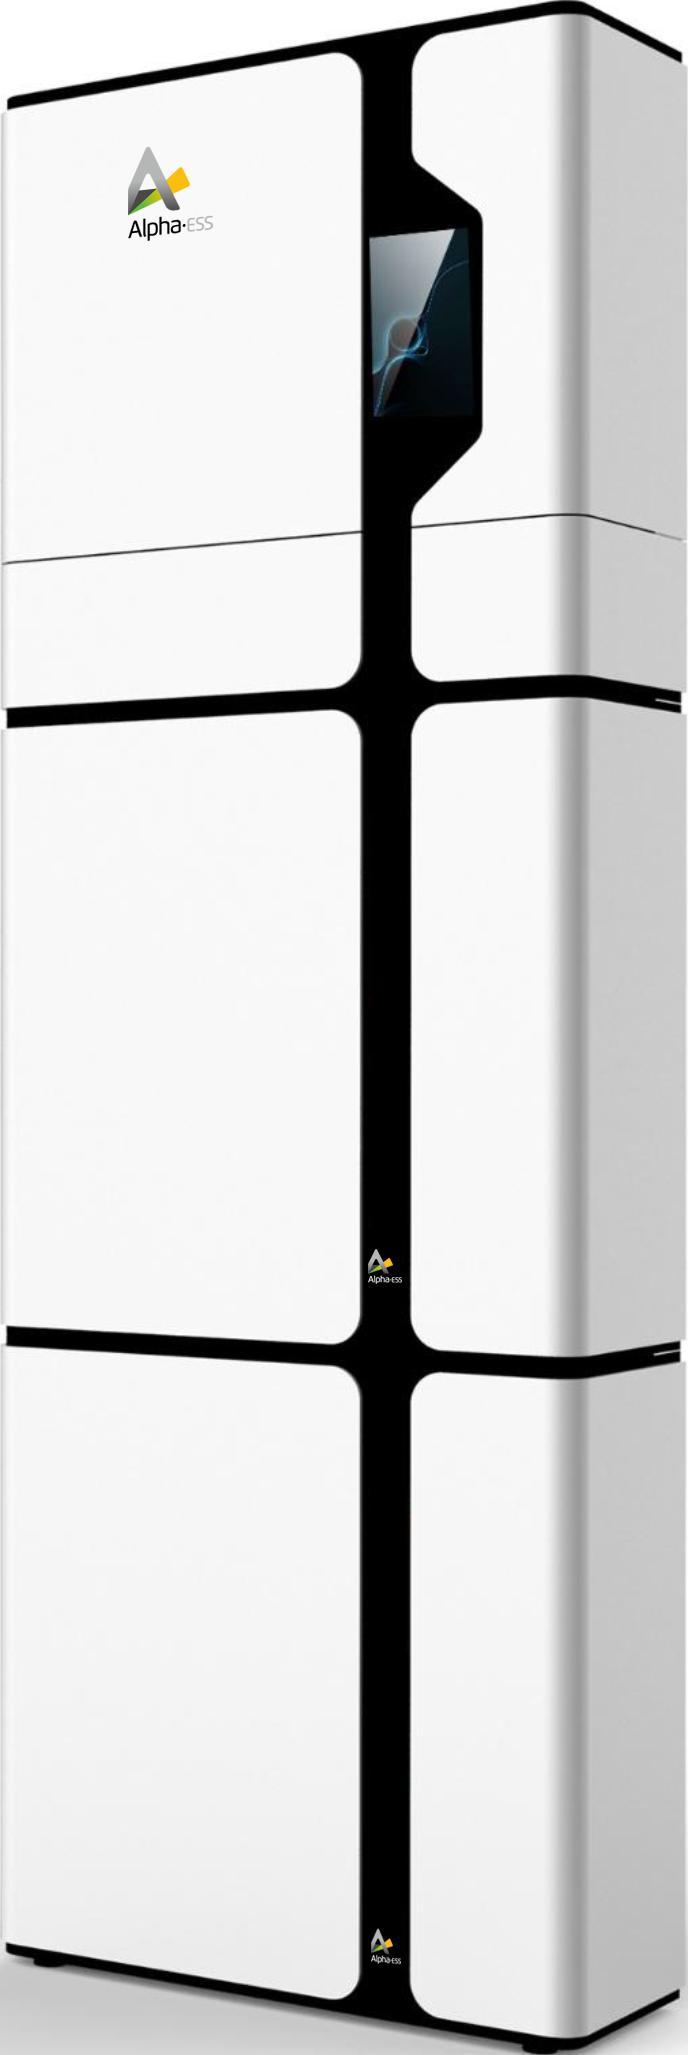 cleantech-storage.org - cleantech-switzerland.org